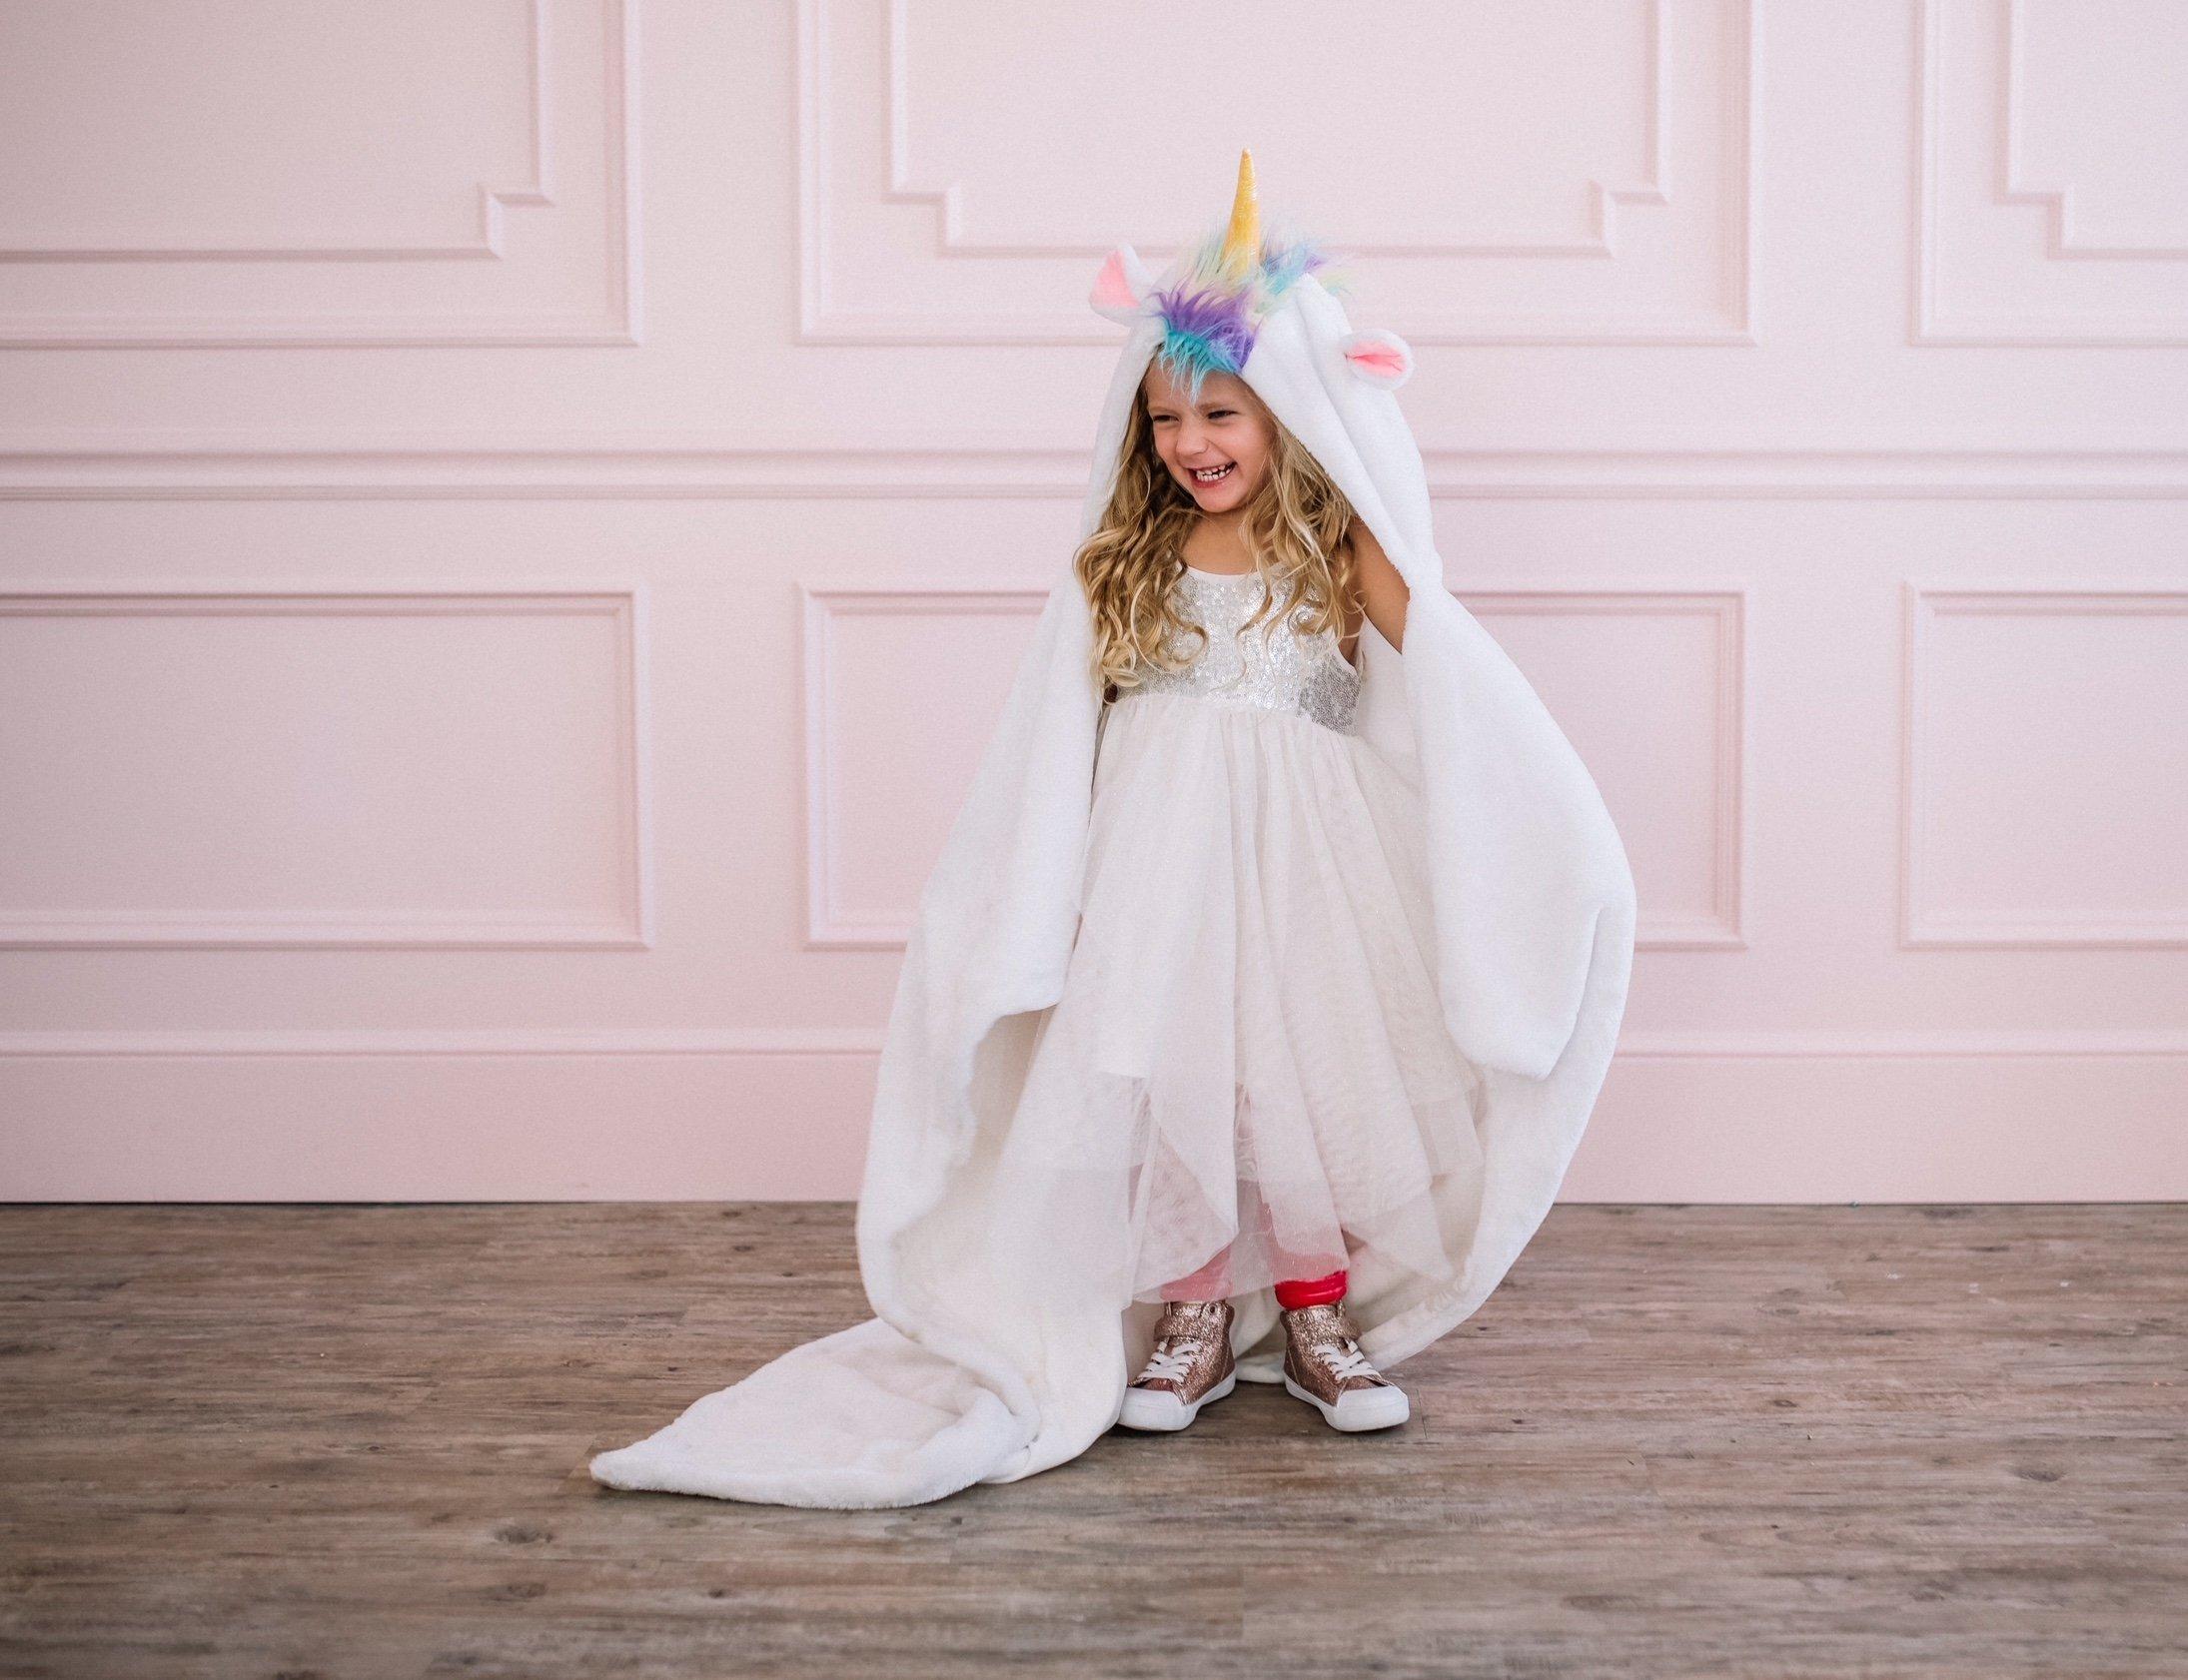 JaceyLane - Unicorn Blanket | Comfortable Soft Mink Fabric Blanket| by JaceyLane (Image #6)